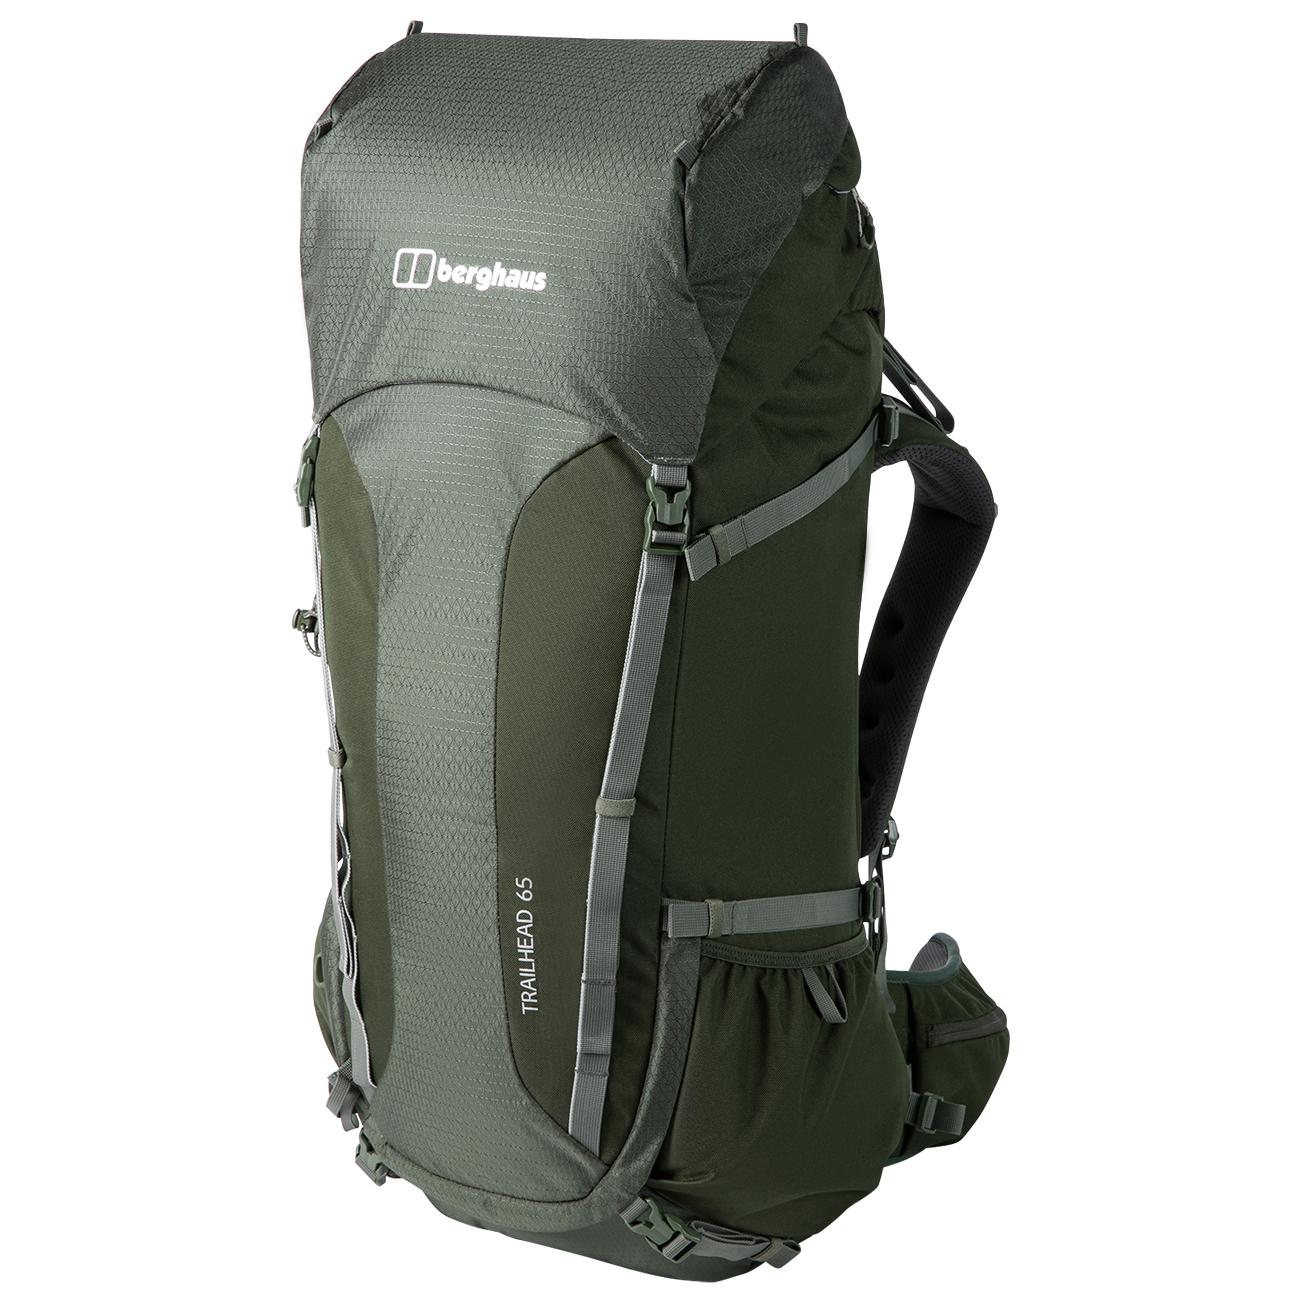 Free Rucksack Delivery UK Berghaus Trailhead Walking Backpack 65 qnUavF